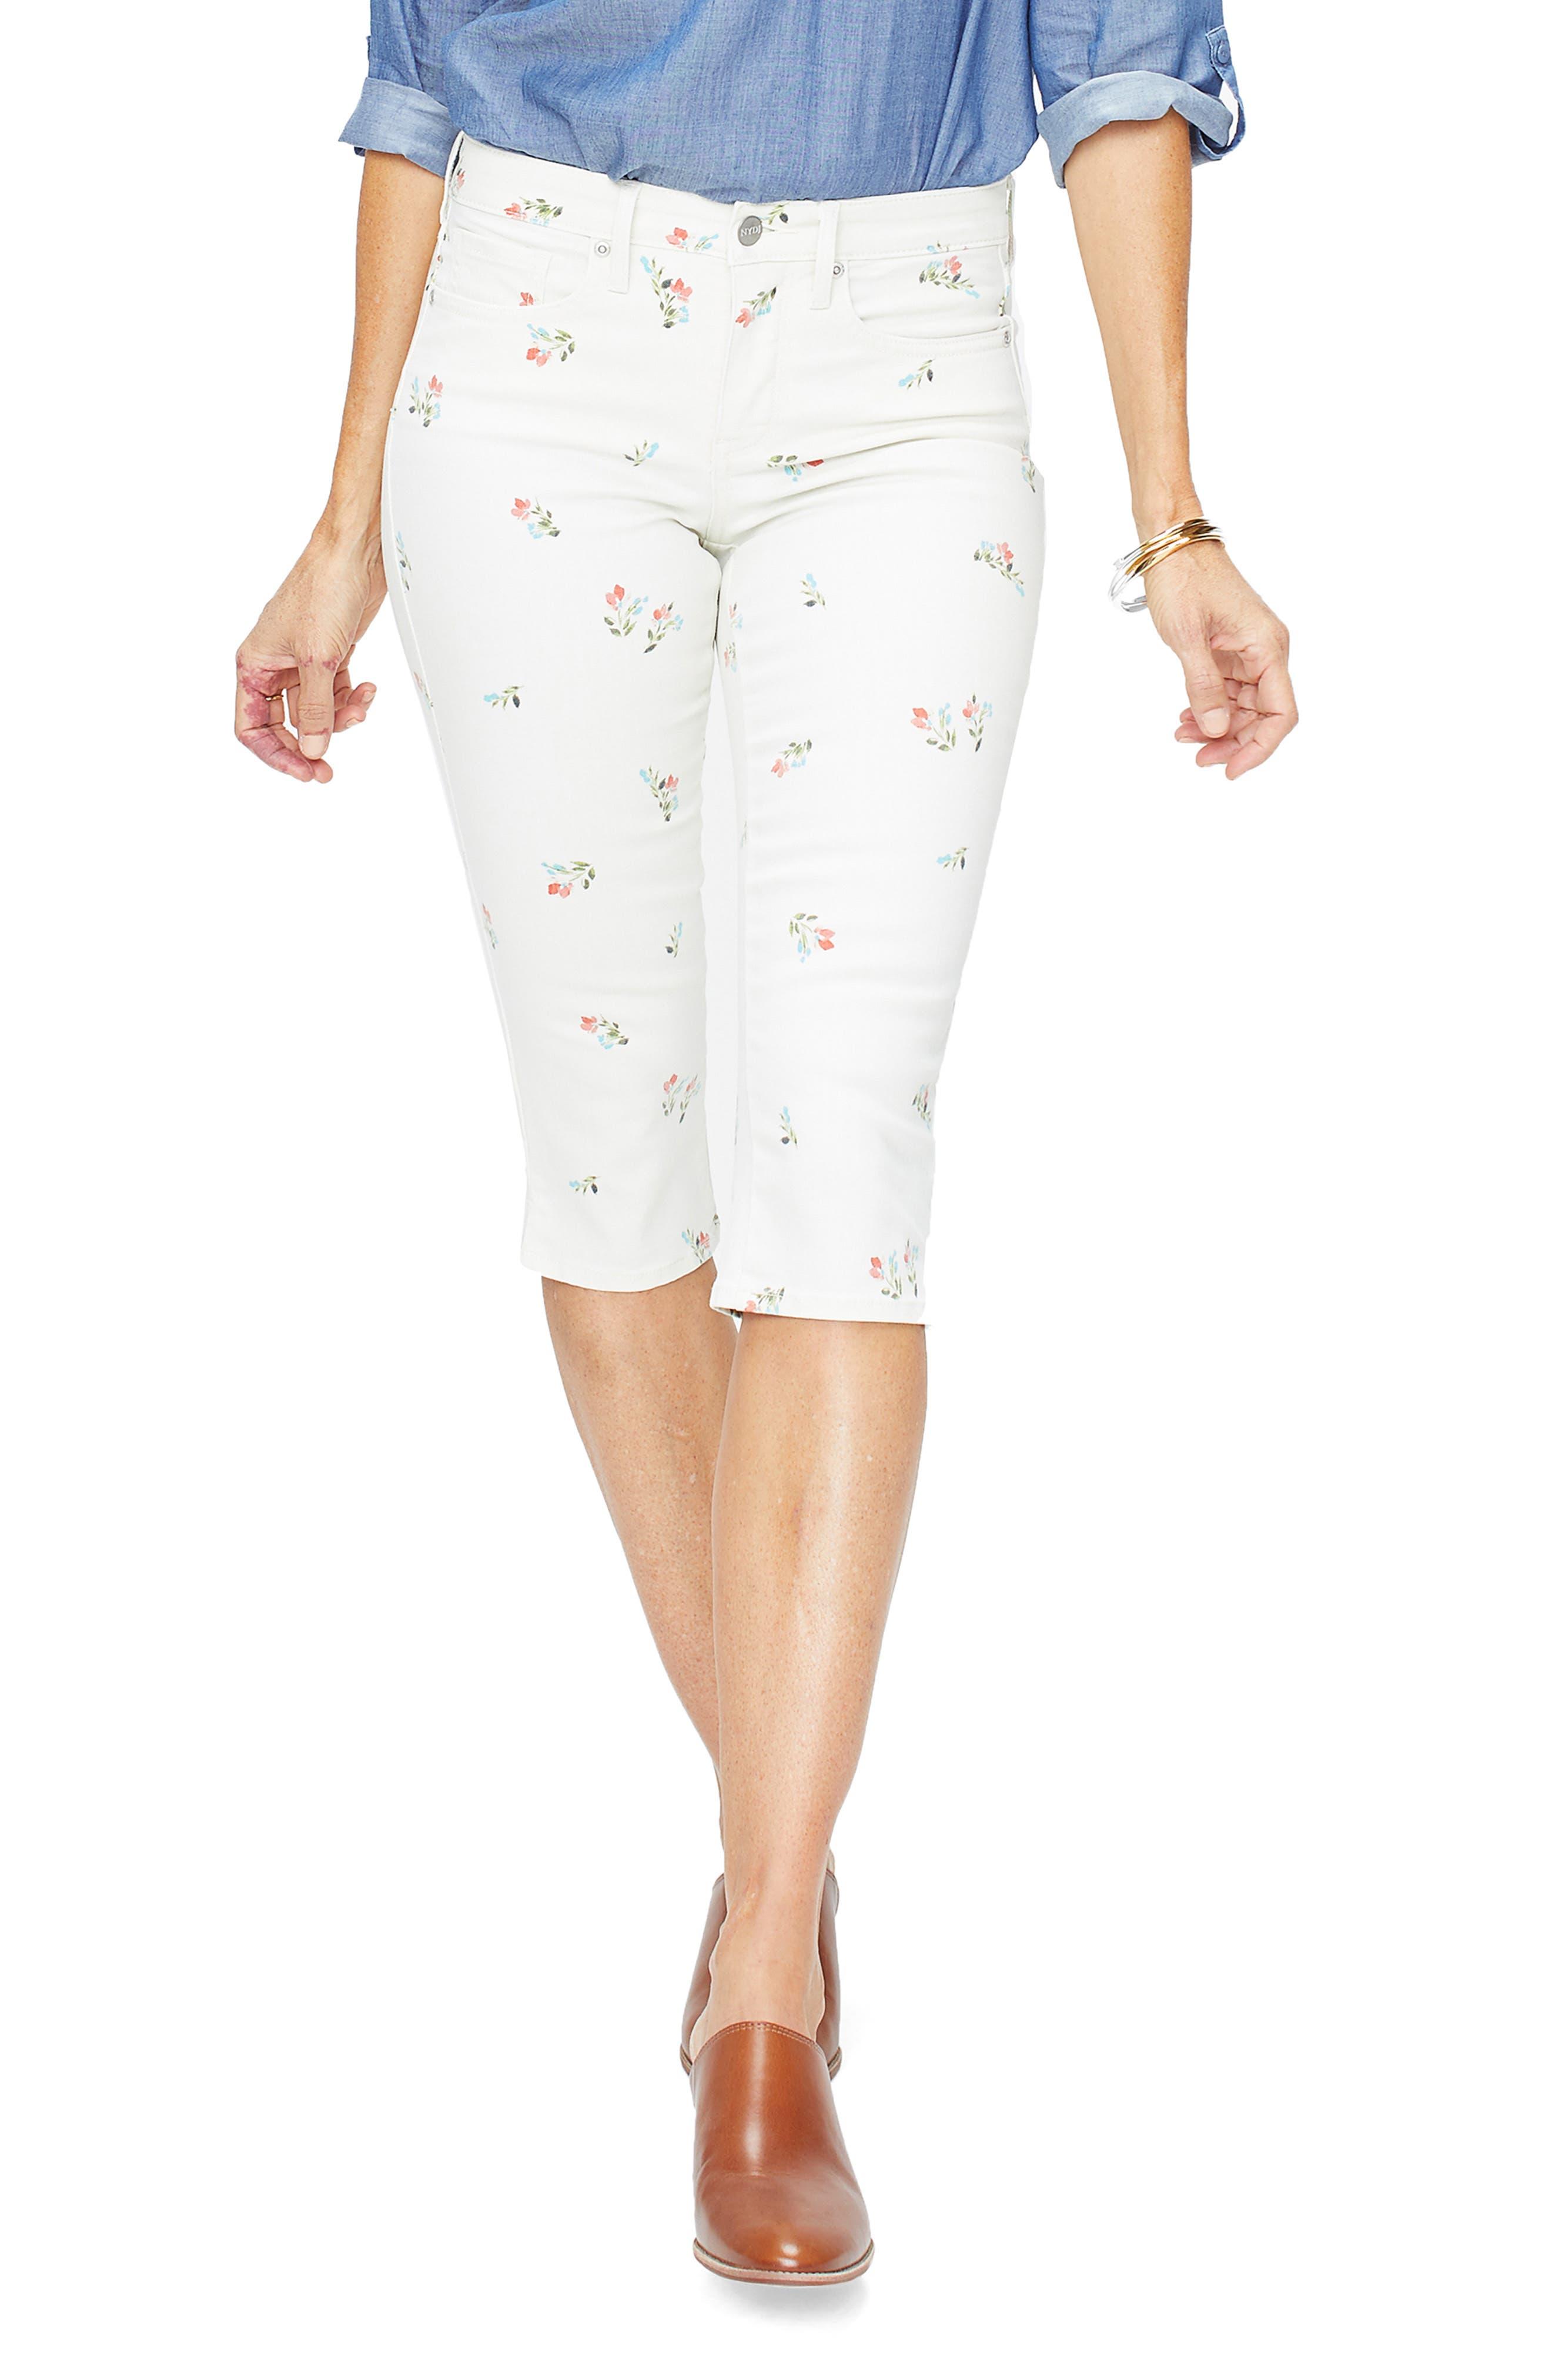 Nydj Floral Print Skinny Capri Pants, White